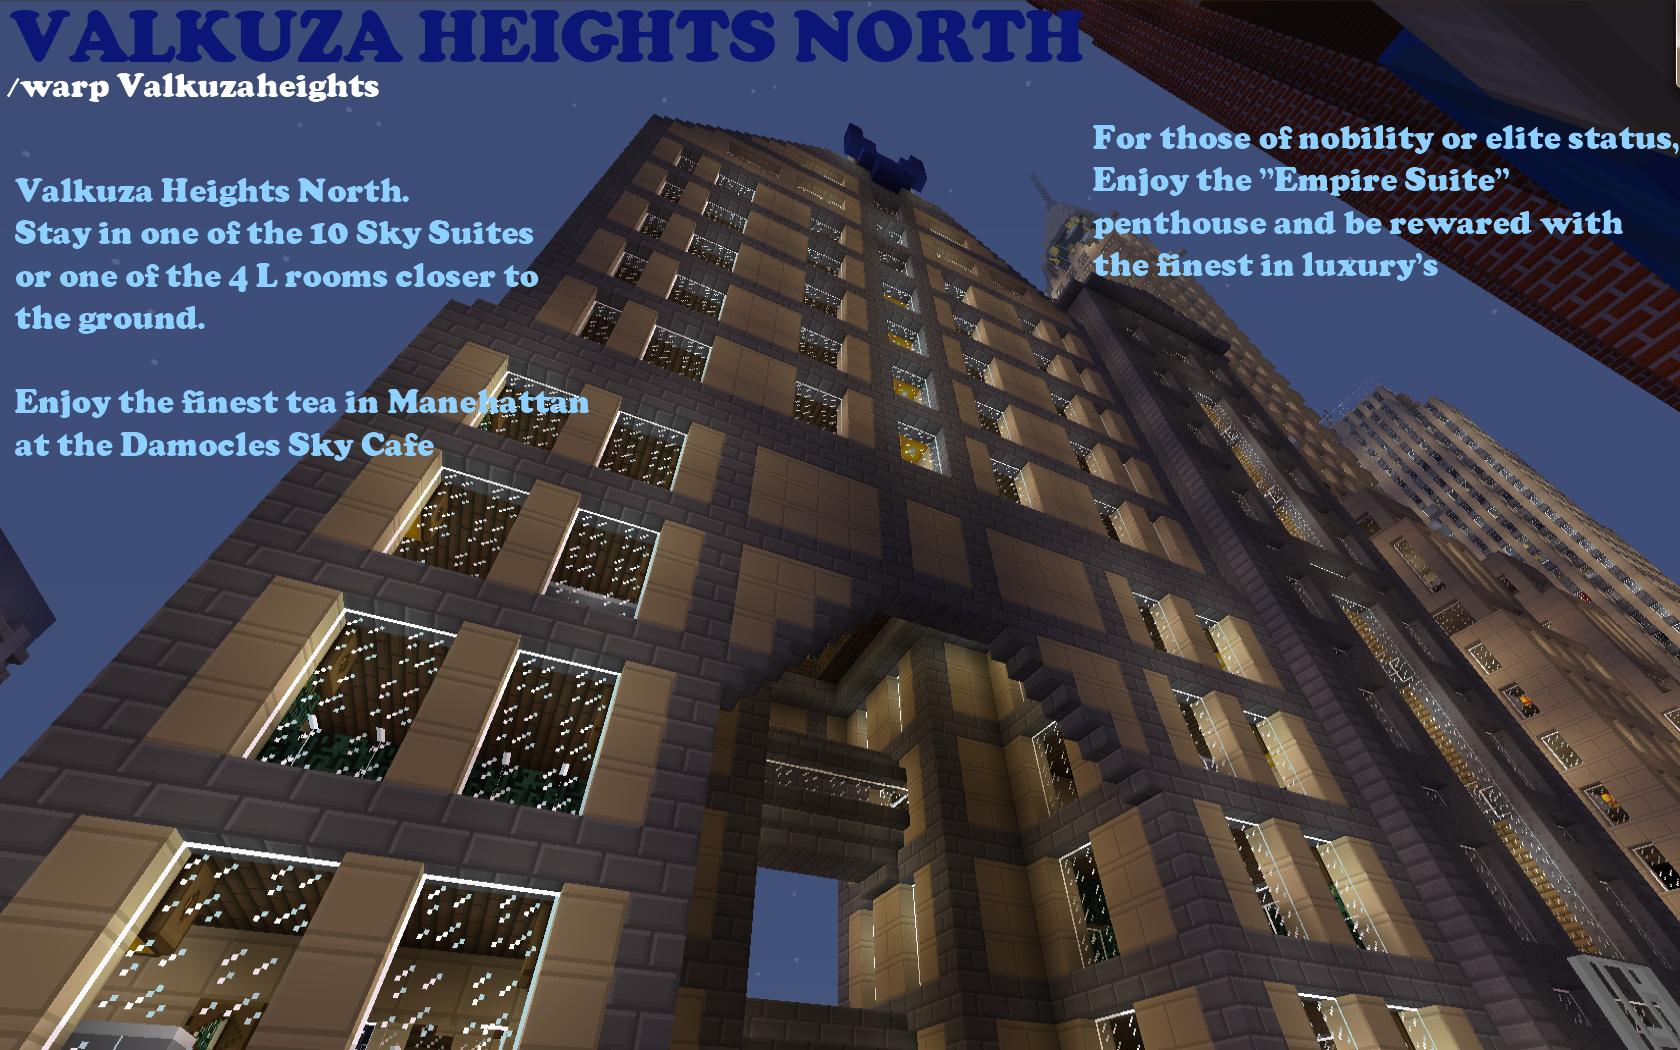 Valkuza Heights North by Gwentari